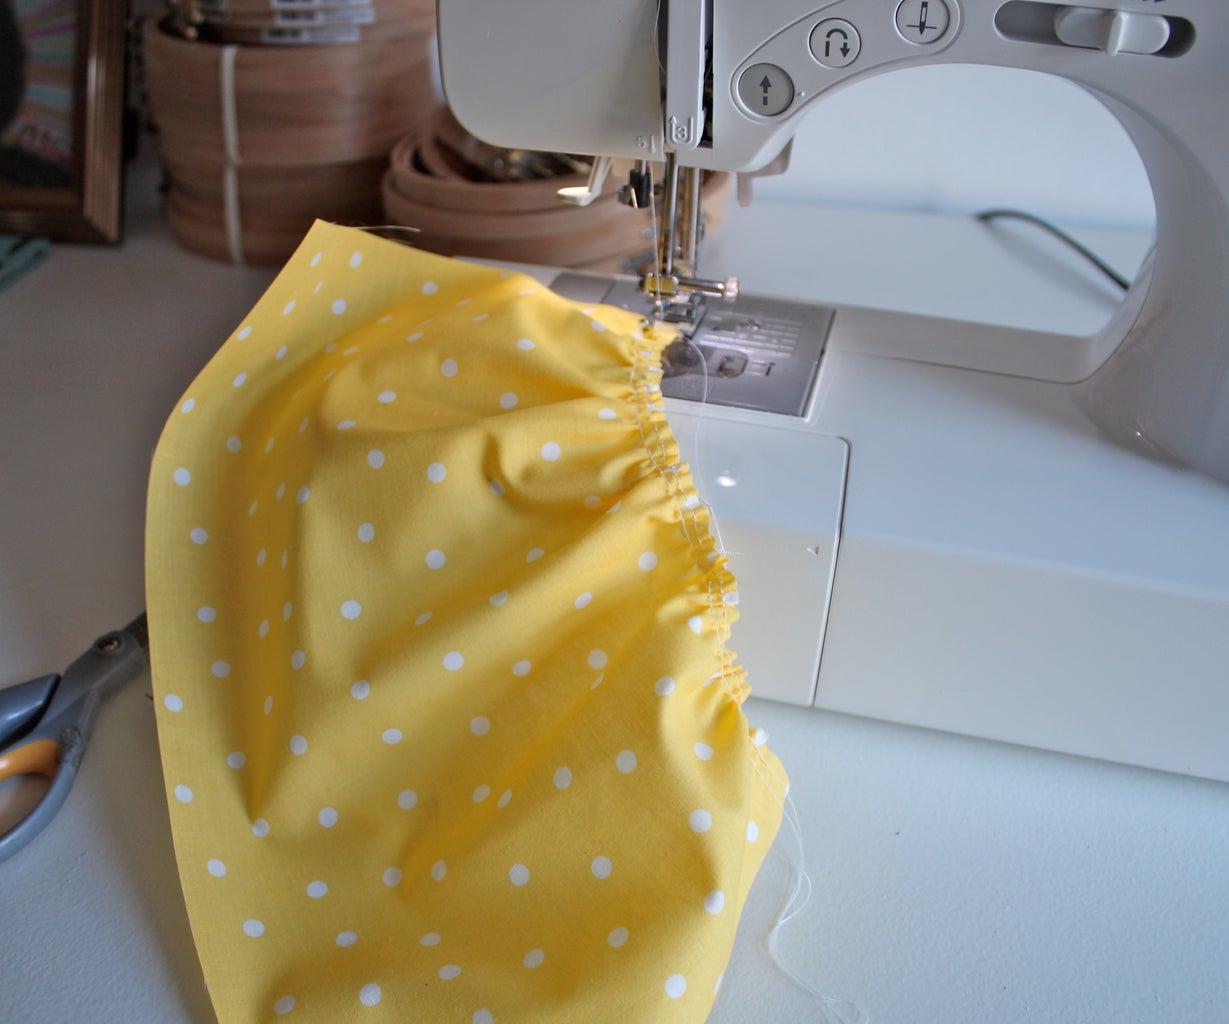 Sew It to Finish